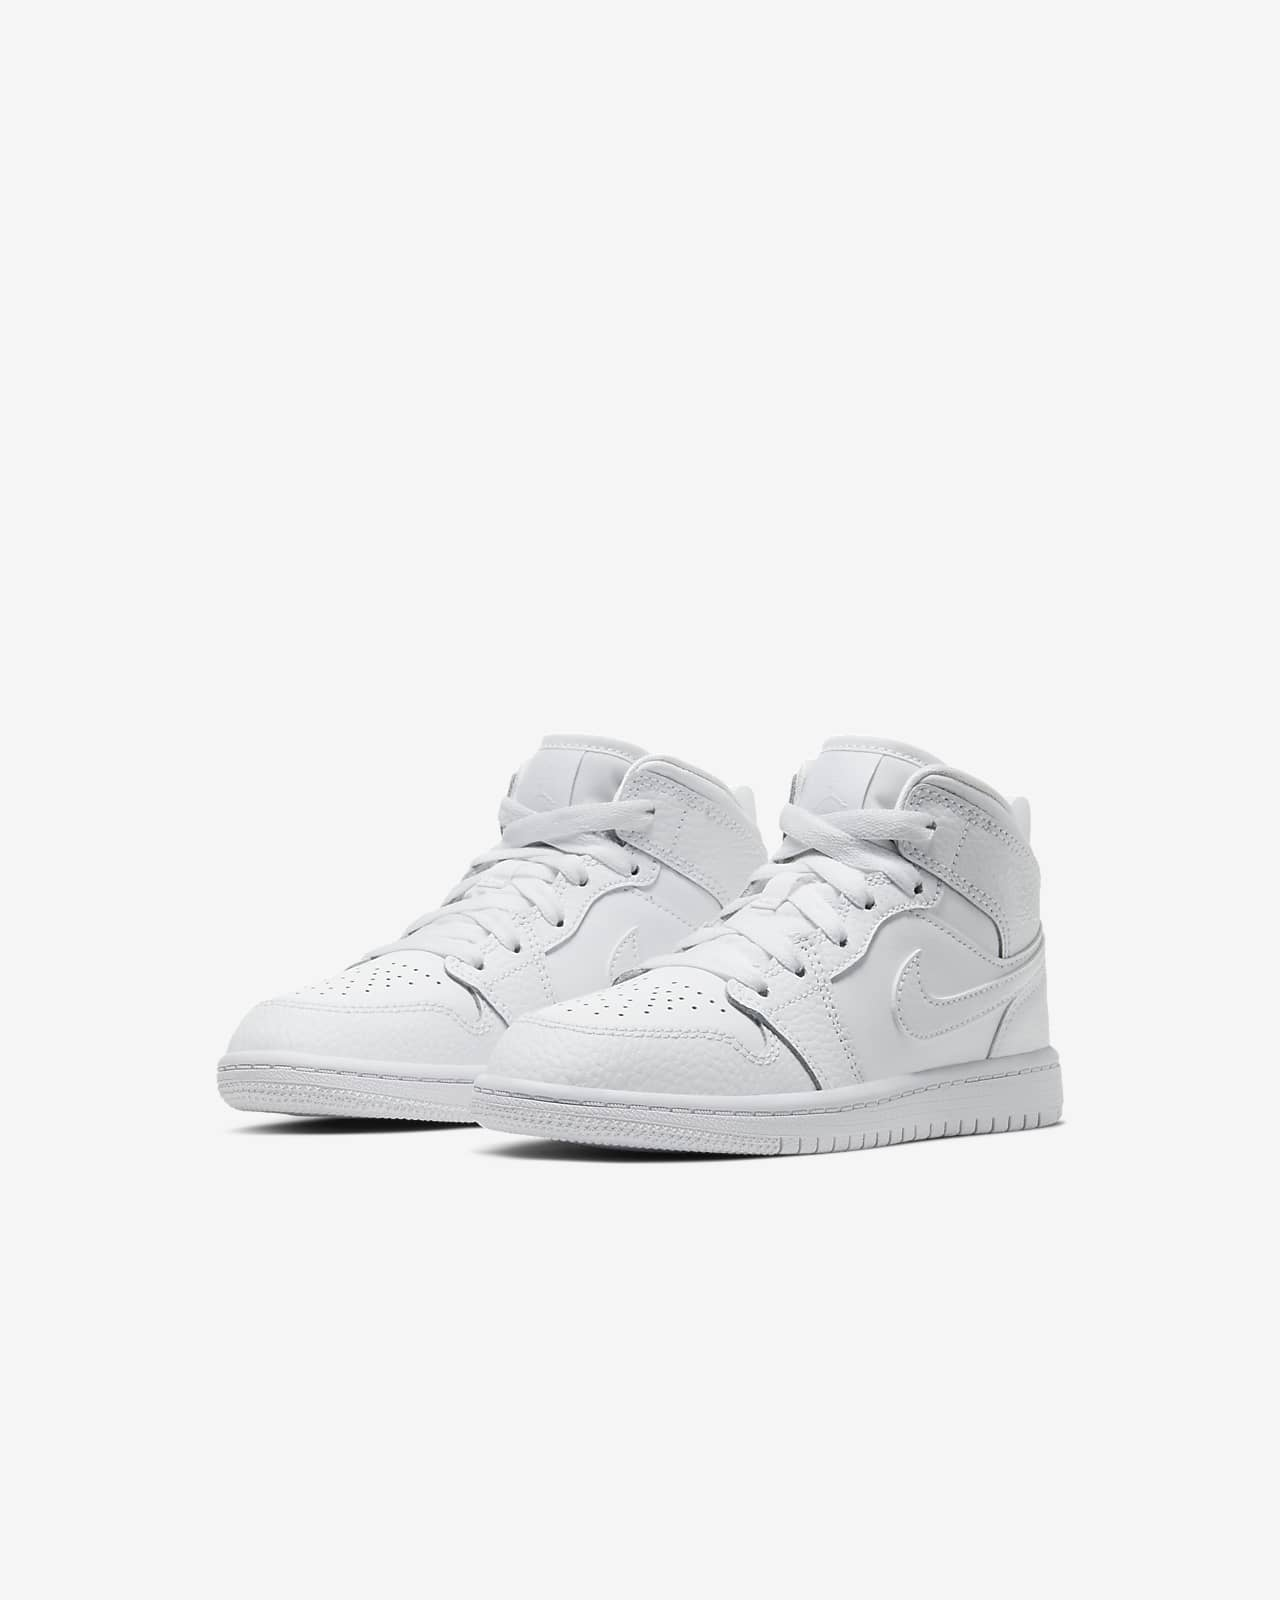 Chaussure Jordan 1 Mid pour Jeune enfant. Nike LU